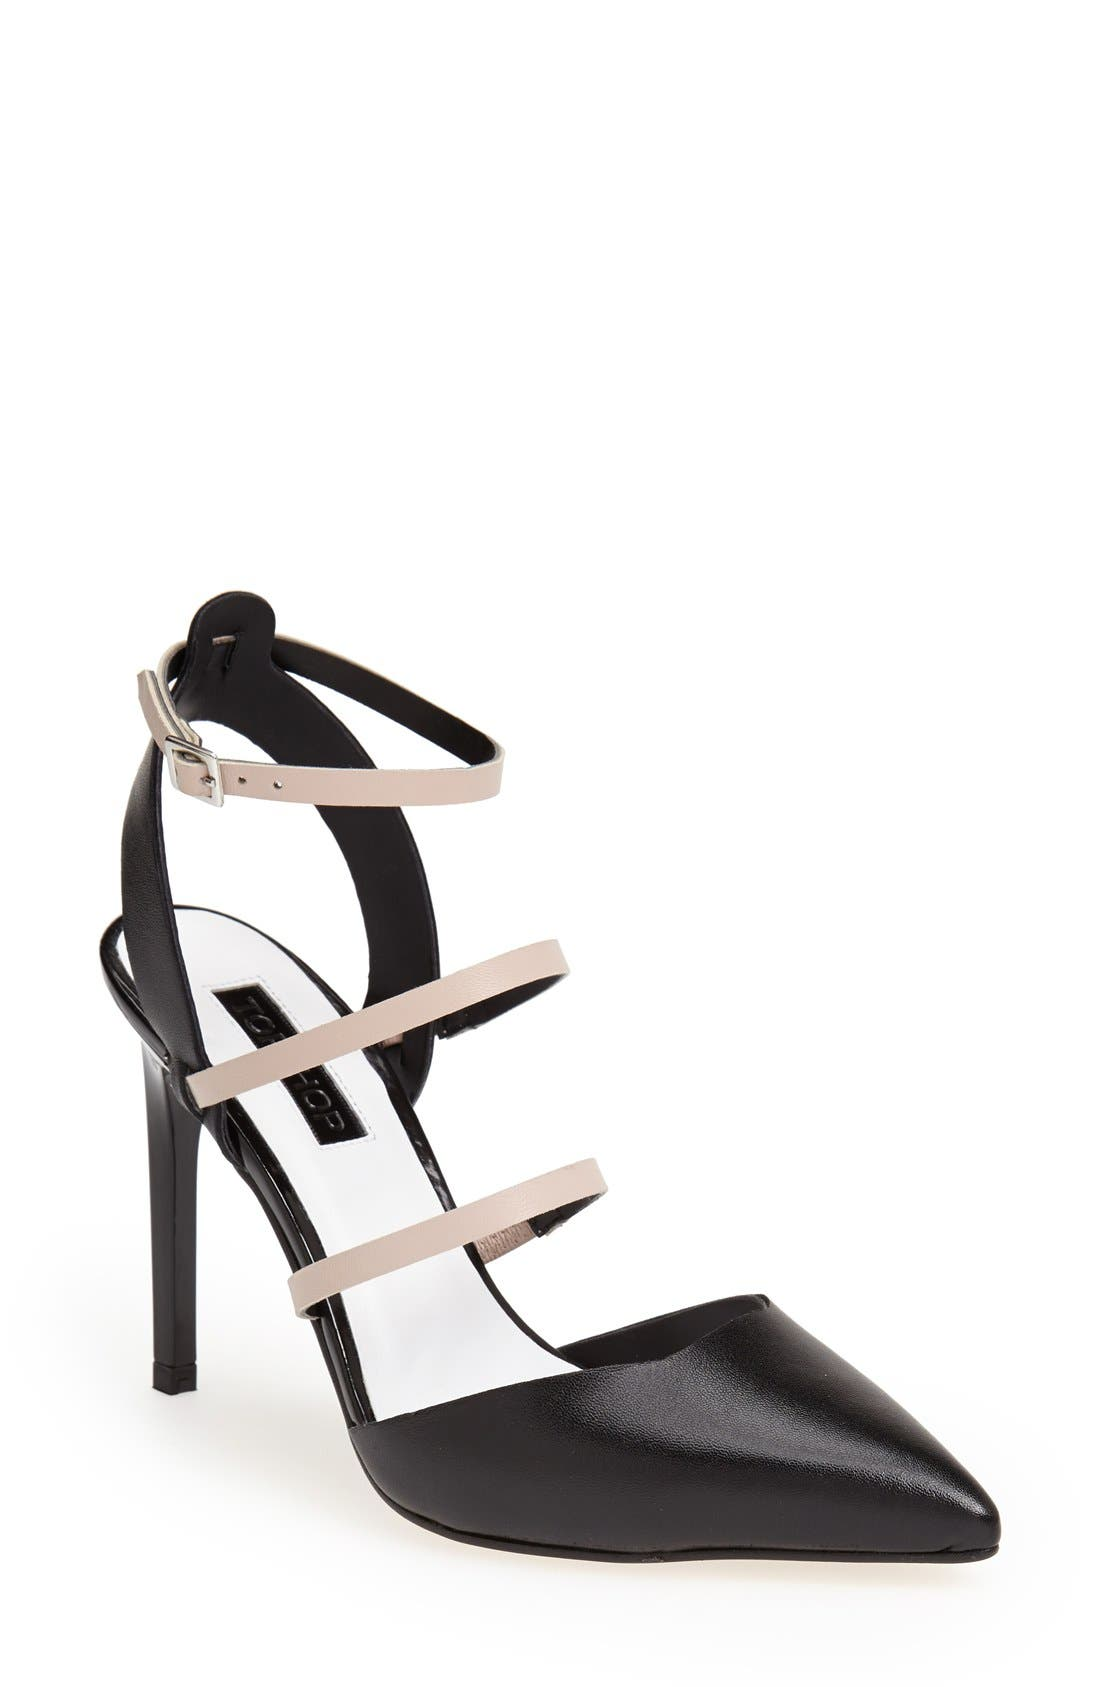 Main Image - Topshop 'Gauche' Skinny Heel Pump (Women)